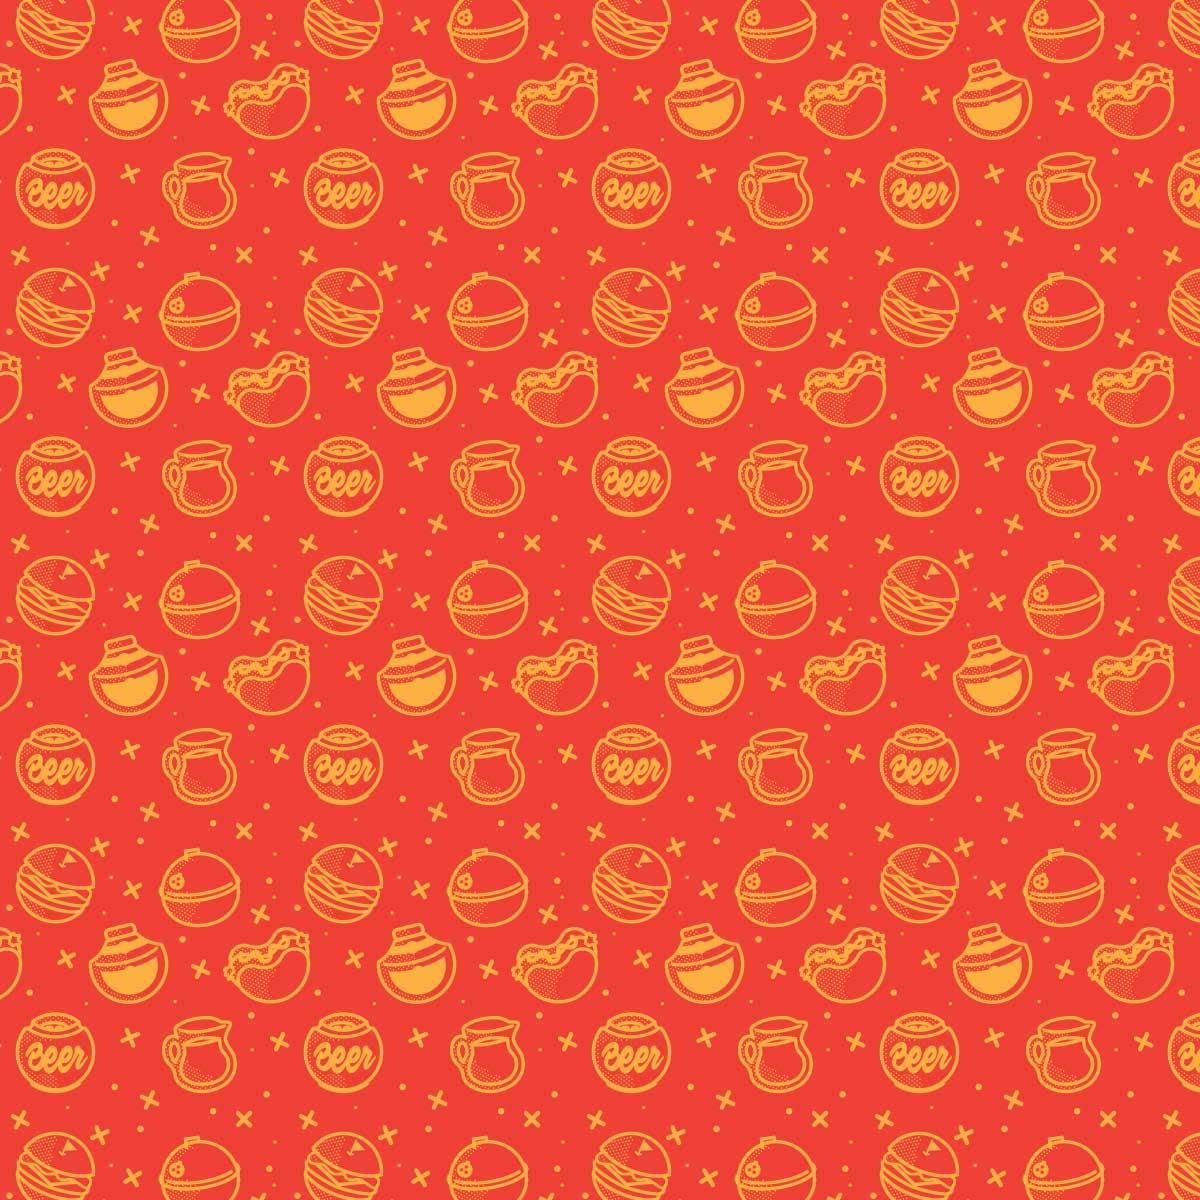 1200x200-BBQ-Pattern-Red.jpg